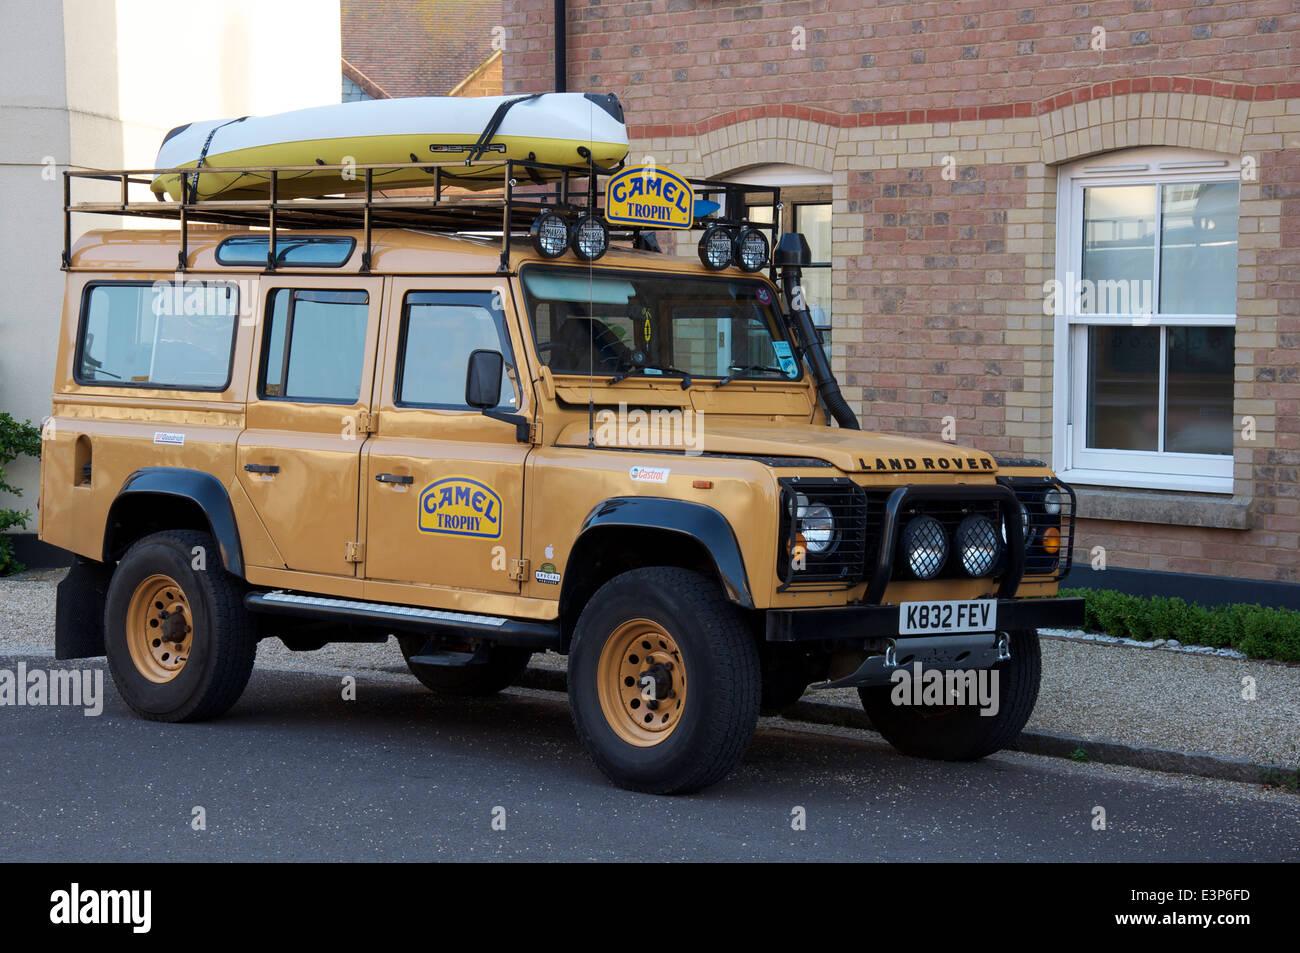 A Camel Trophy Land Rover Defender A Rugged Off Road